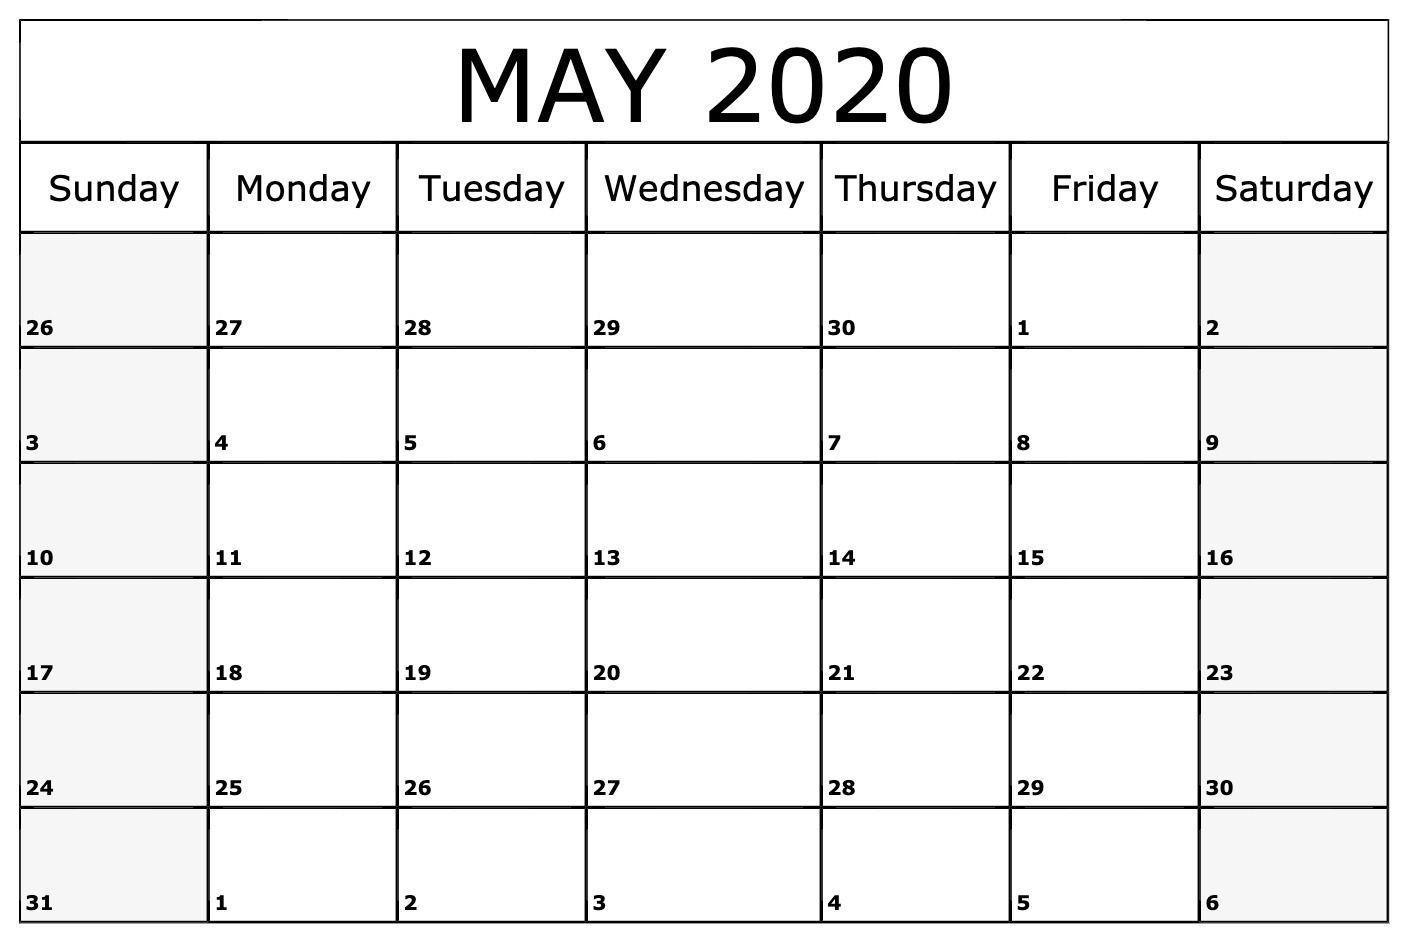 Free Cute May 2020 Calendar Template   Printable Calendar Within Sunrise Sunset Calendar Printable